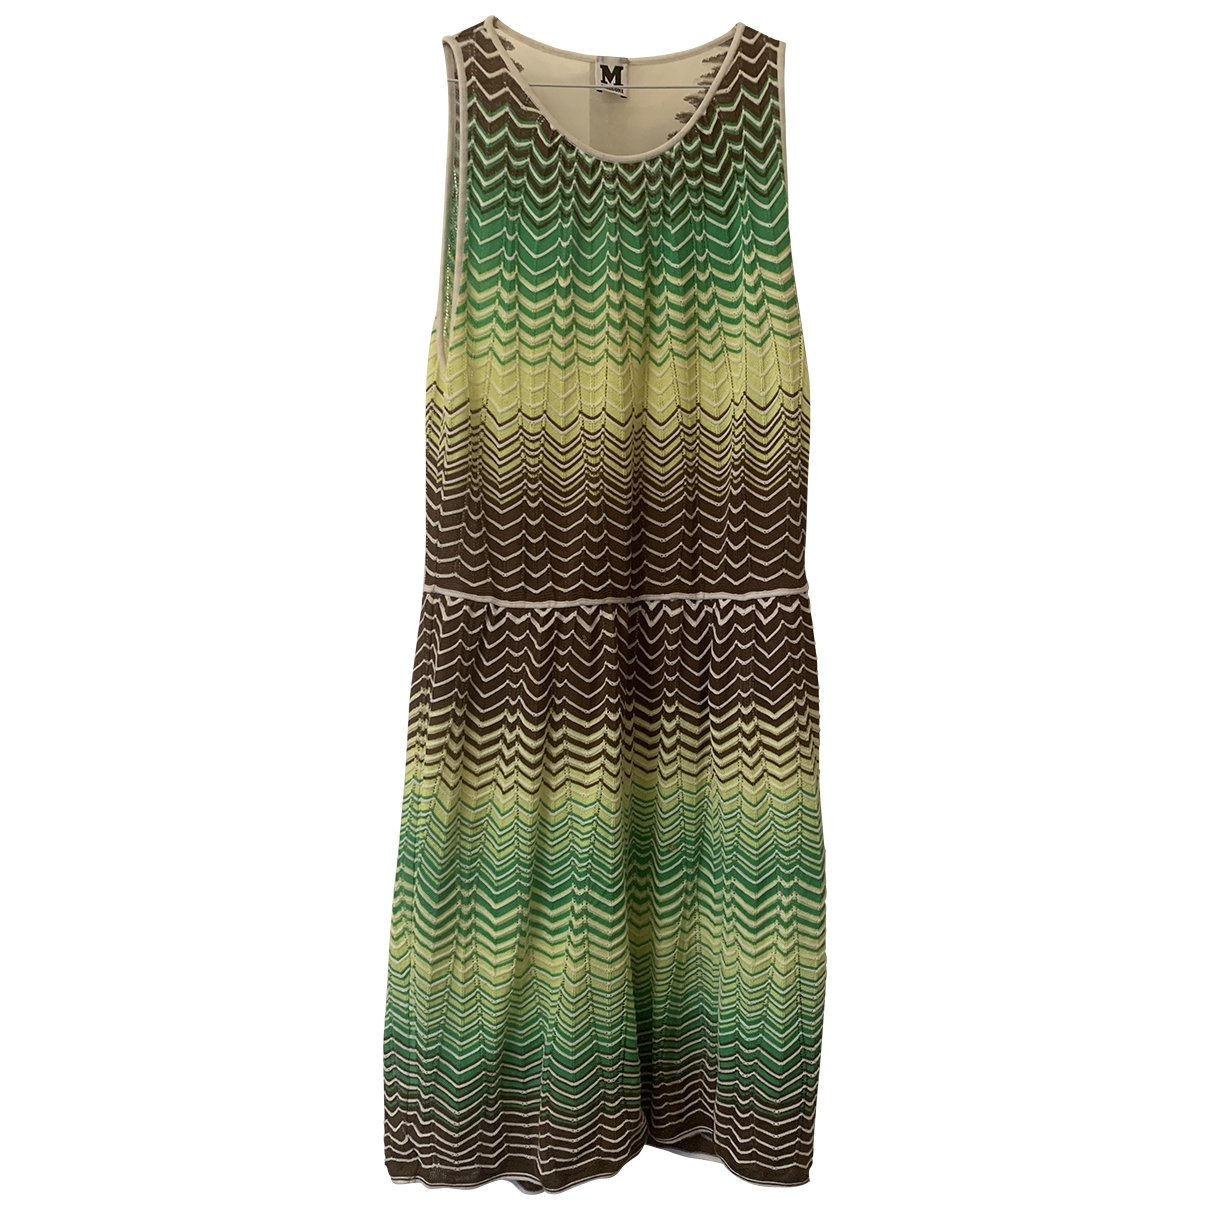 M Missoni \N Cotton dress for Women 48 IT